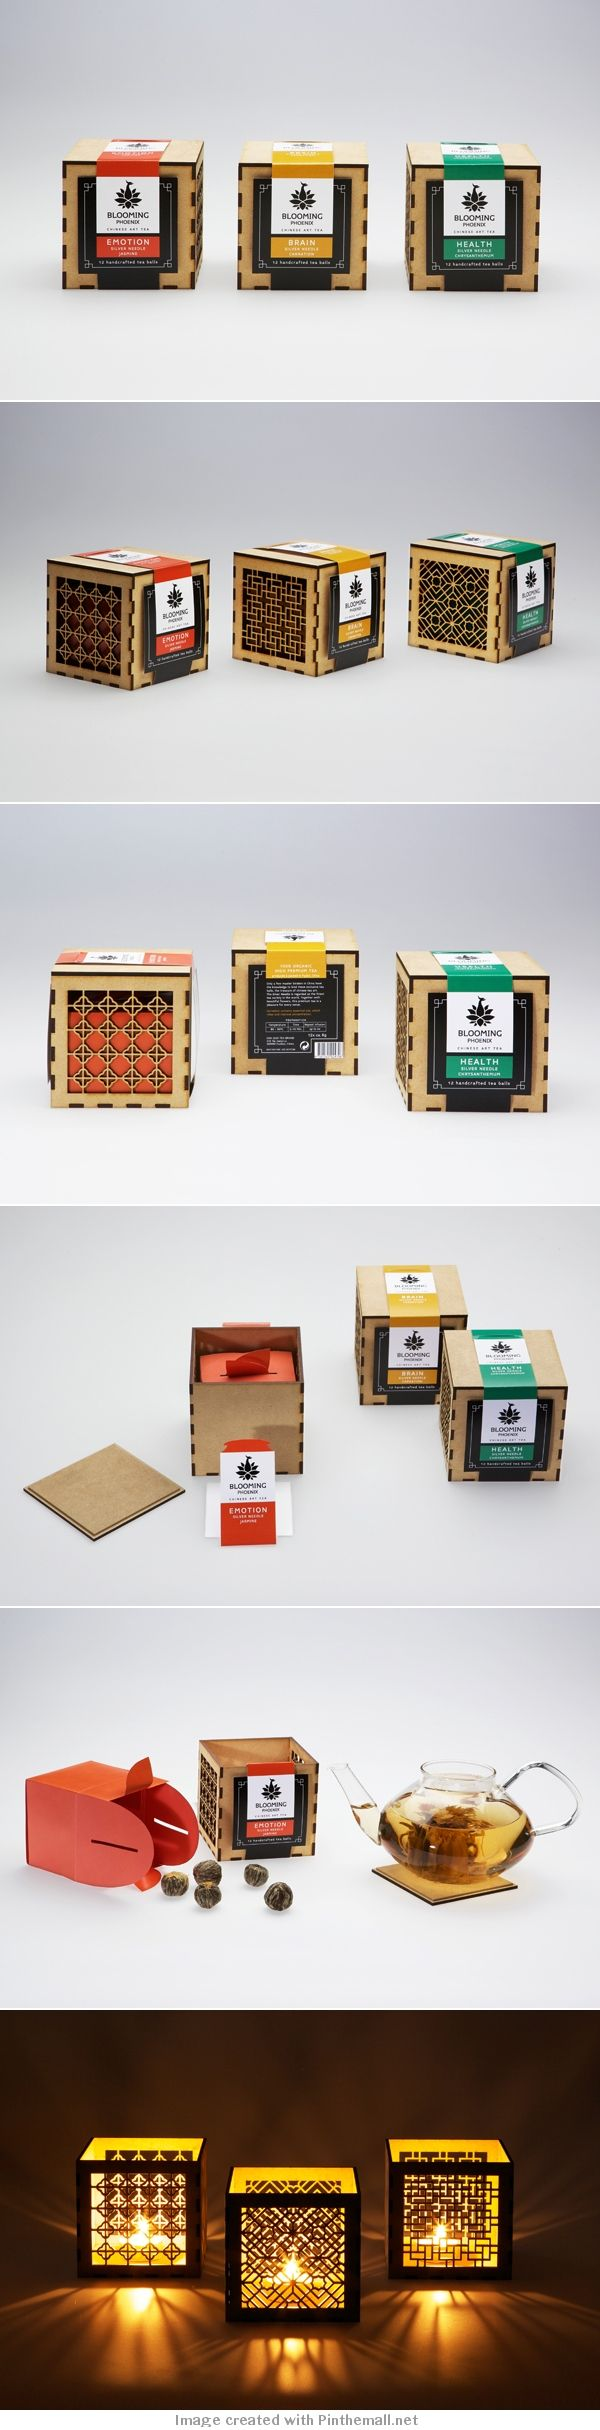 BLOOMING PHOENIX #packaging concept for a flowering #tea brand PD created via https://www.behance.net/gallery/Blooming-Phoenix/7427535